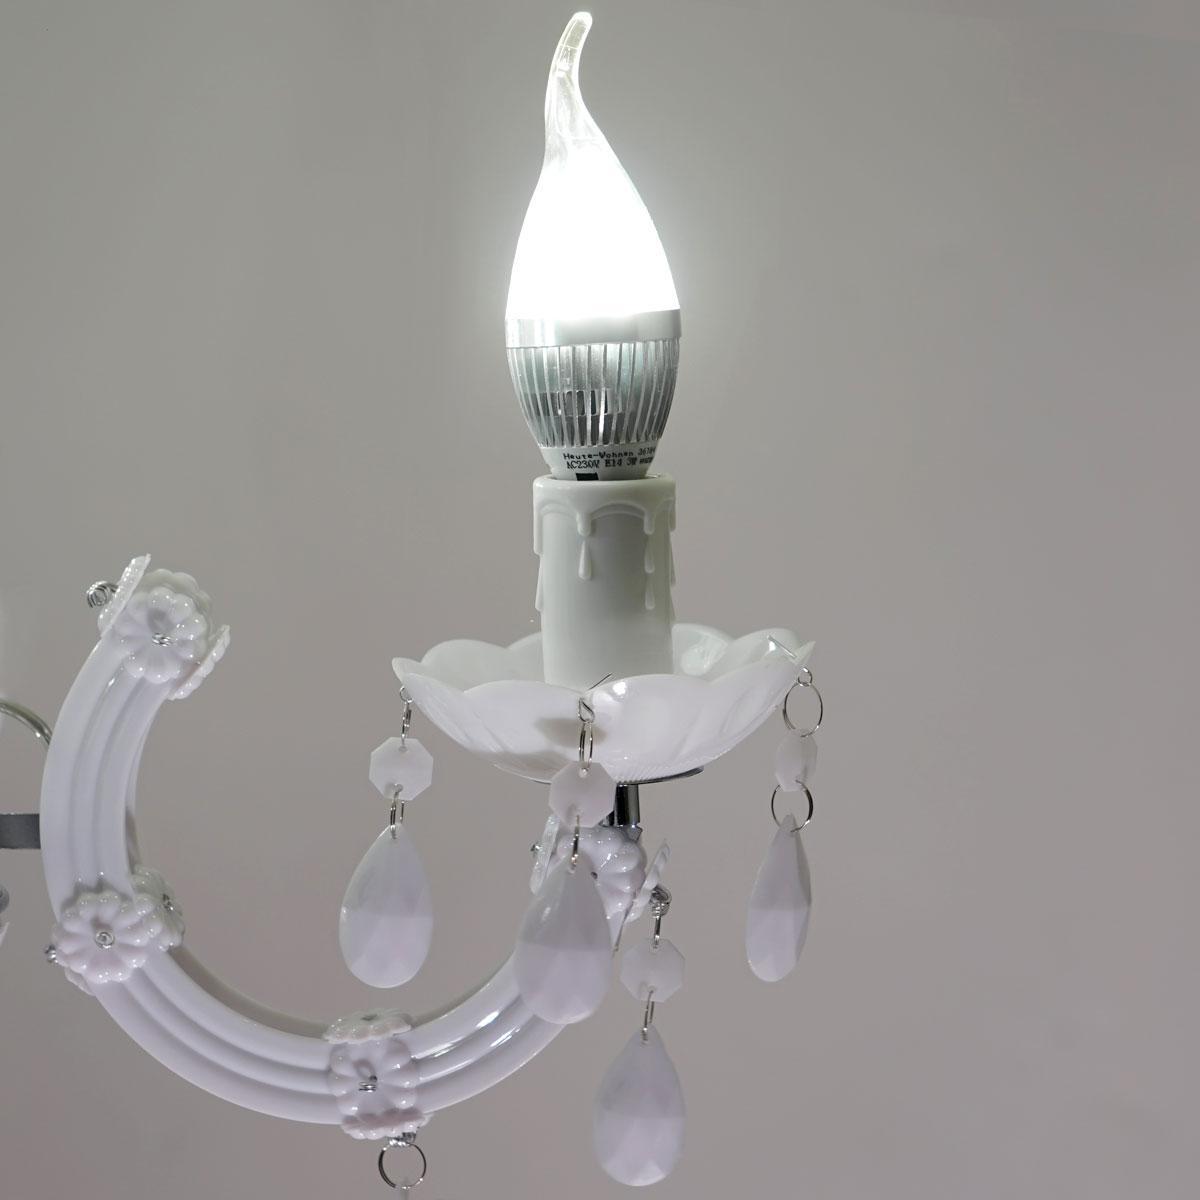 L mpara de ara a atenea 9 apliques con bombillas led color blanco l mpara de ara a atenea 9 - Lampara arana colores ...